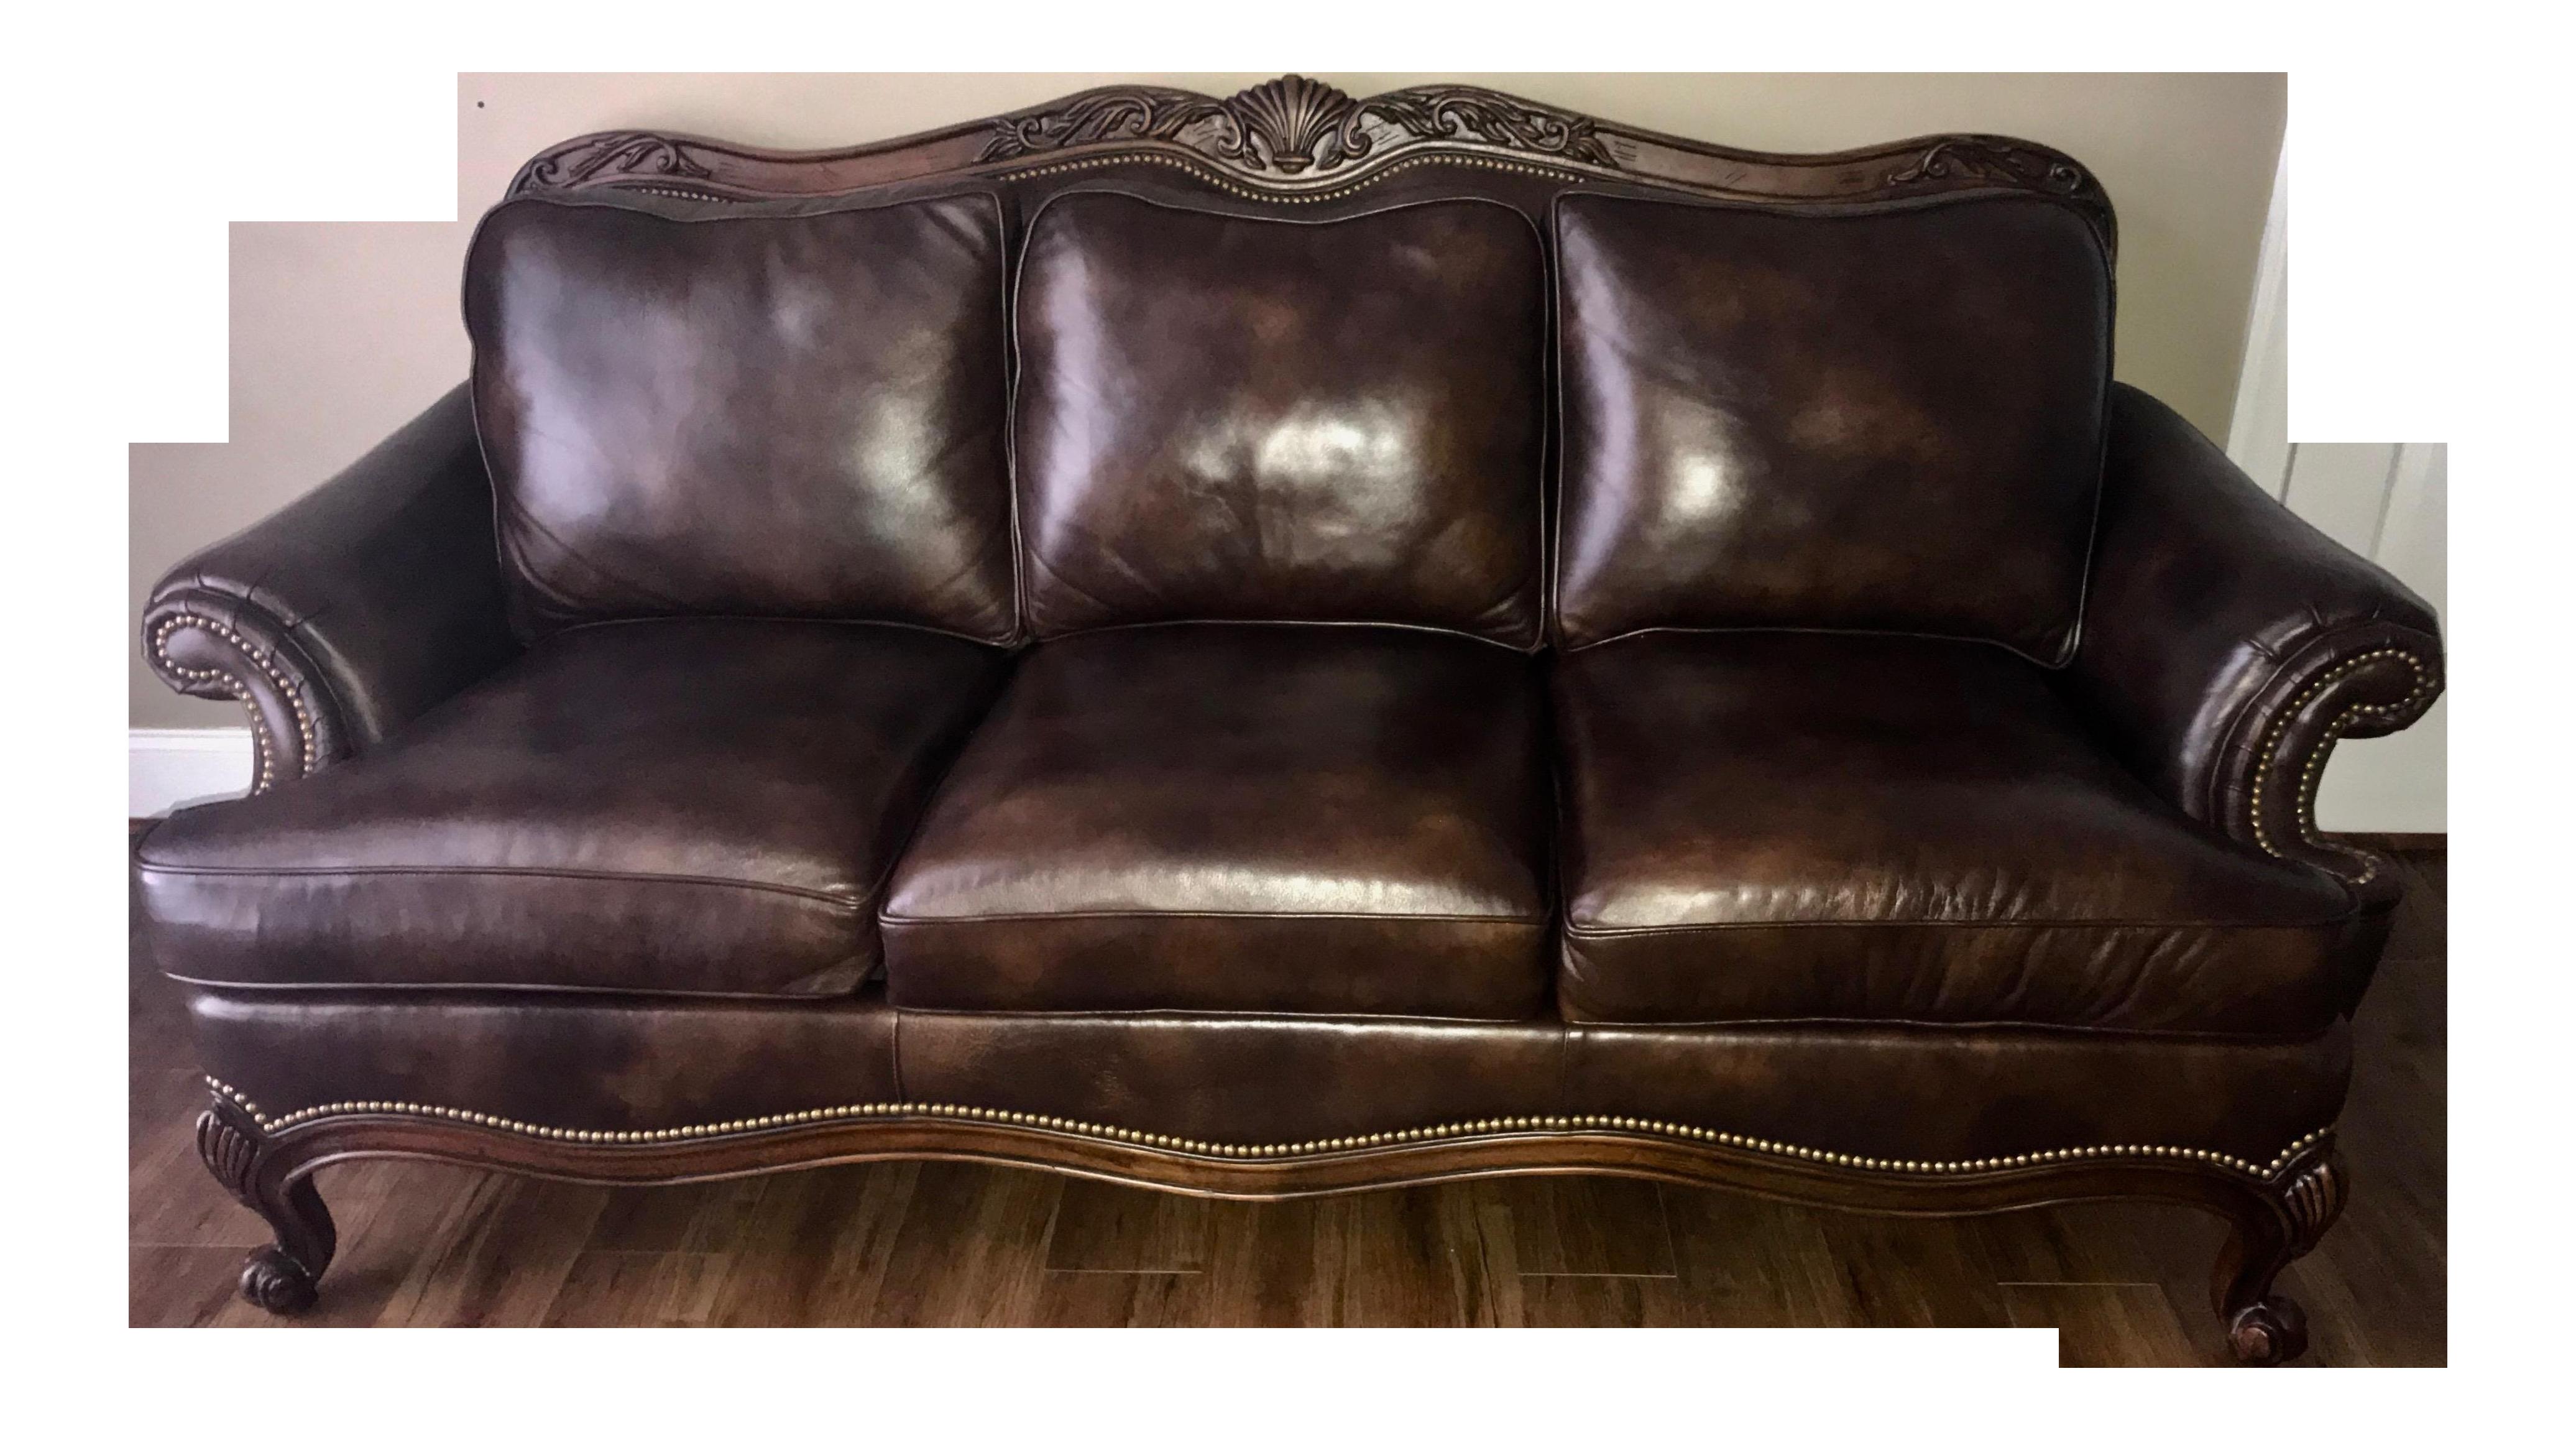 gently used hancock and moore furniture up to 50 off at chairish rh chairish com hancock and moore sofa carmen hancock and moor sofa sale